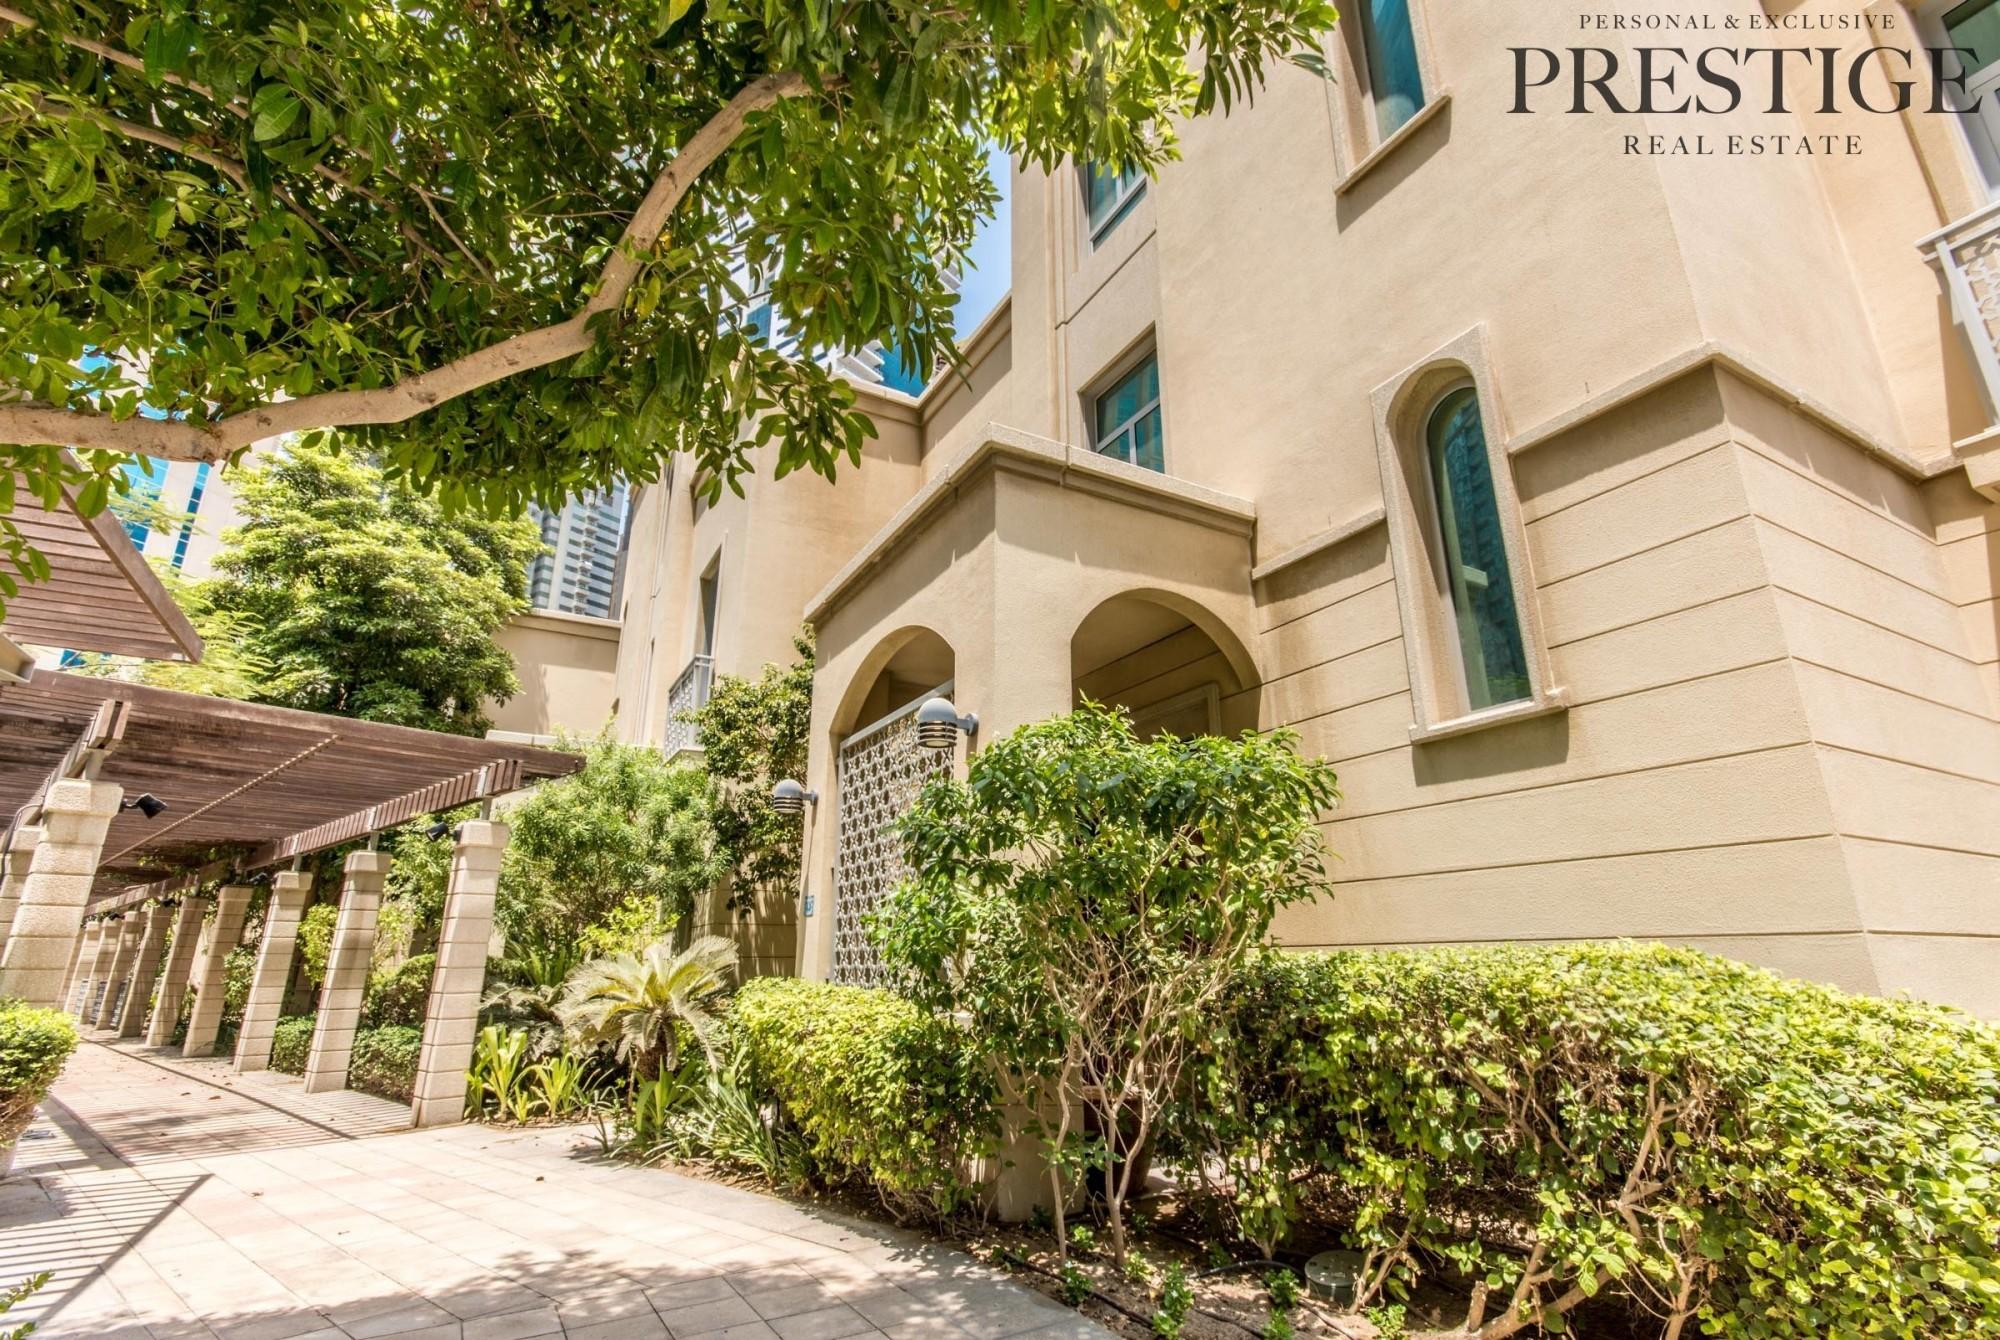 4 Bed Villa | Unfurnished |  Garden View | Dubai Marina